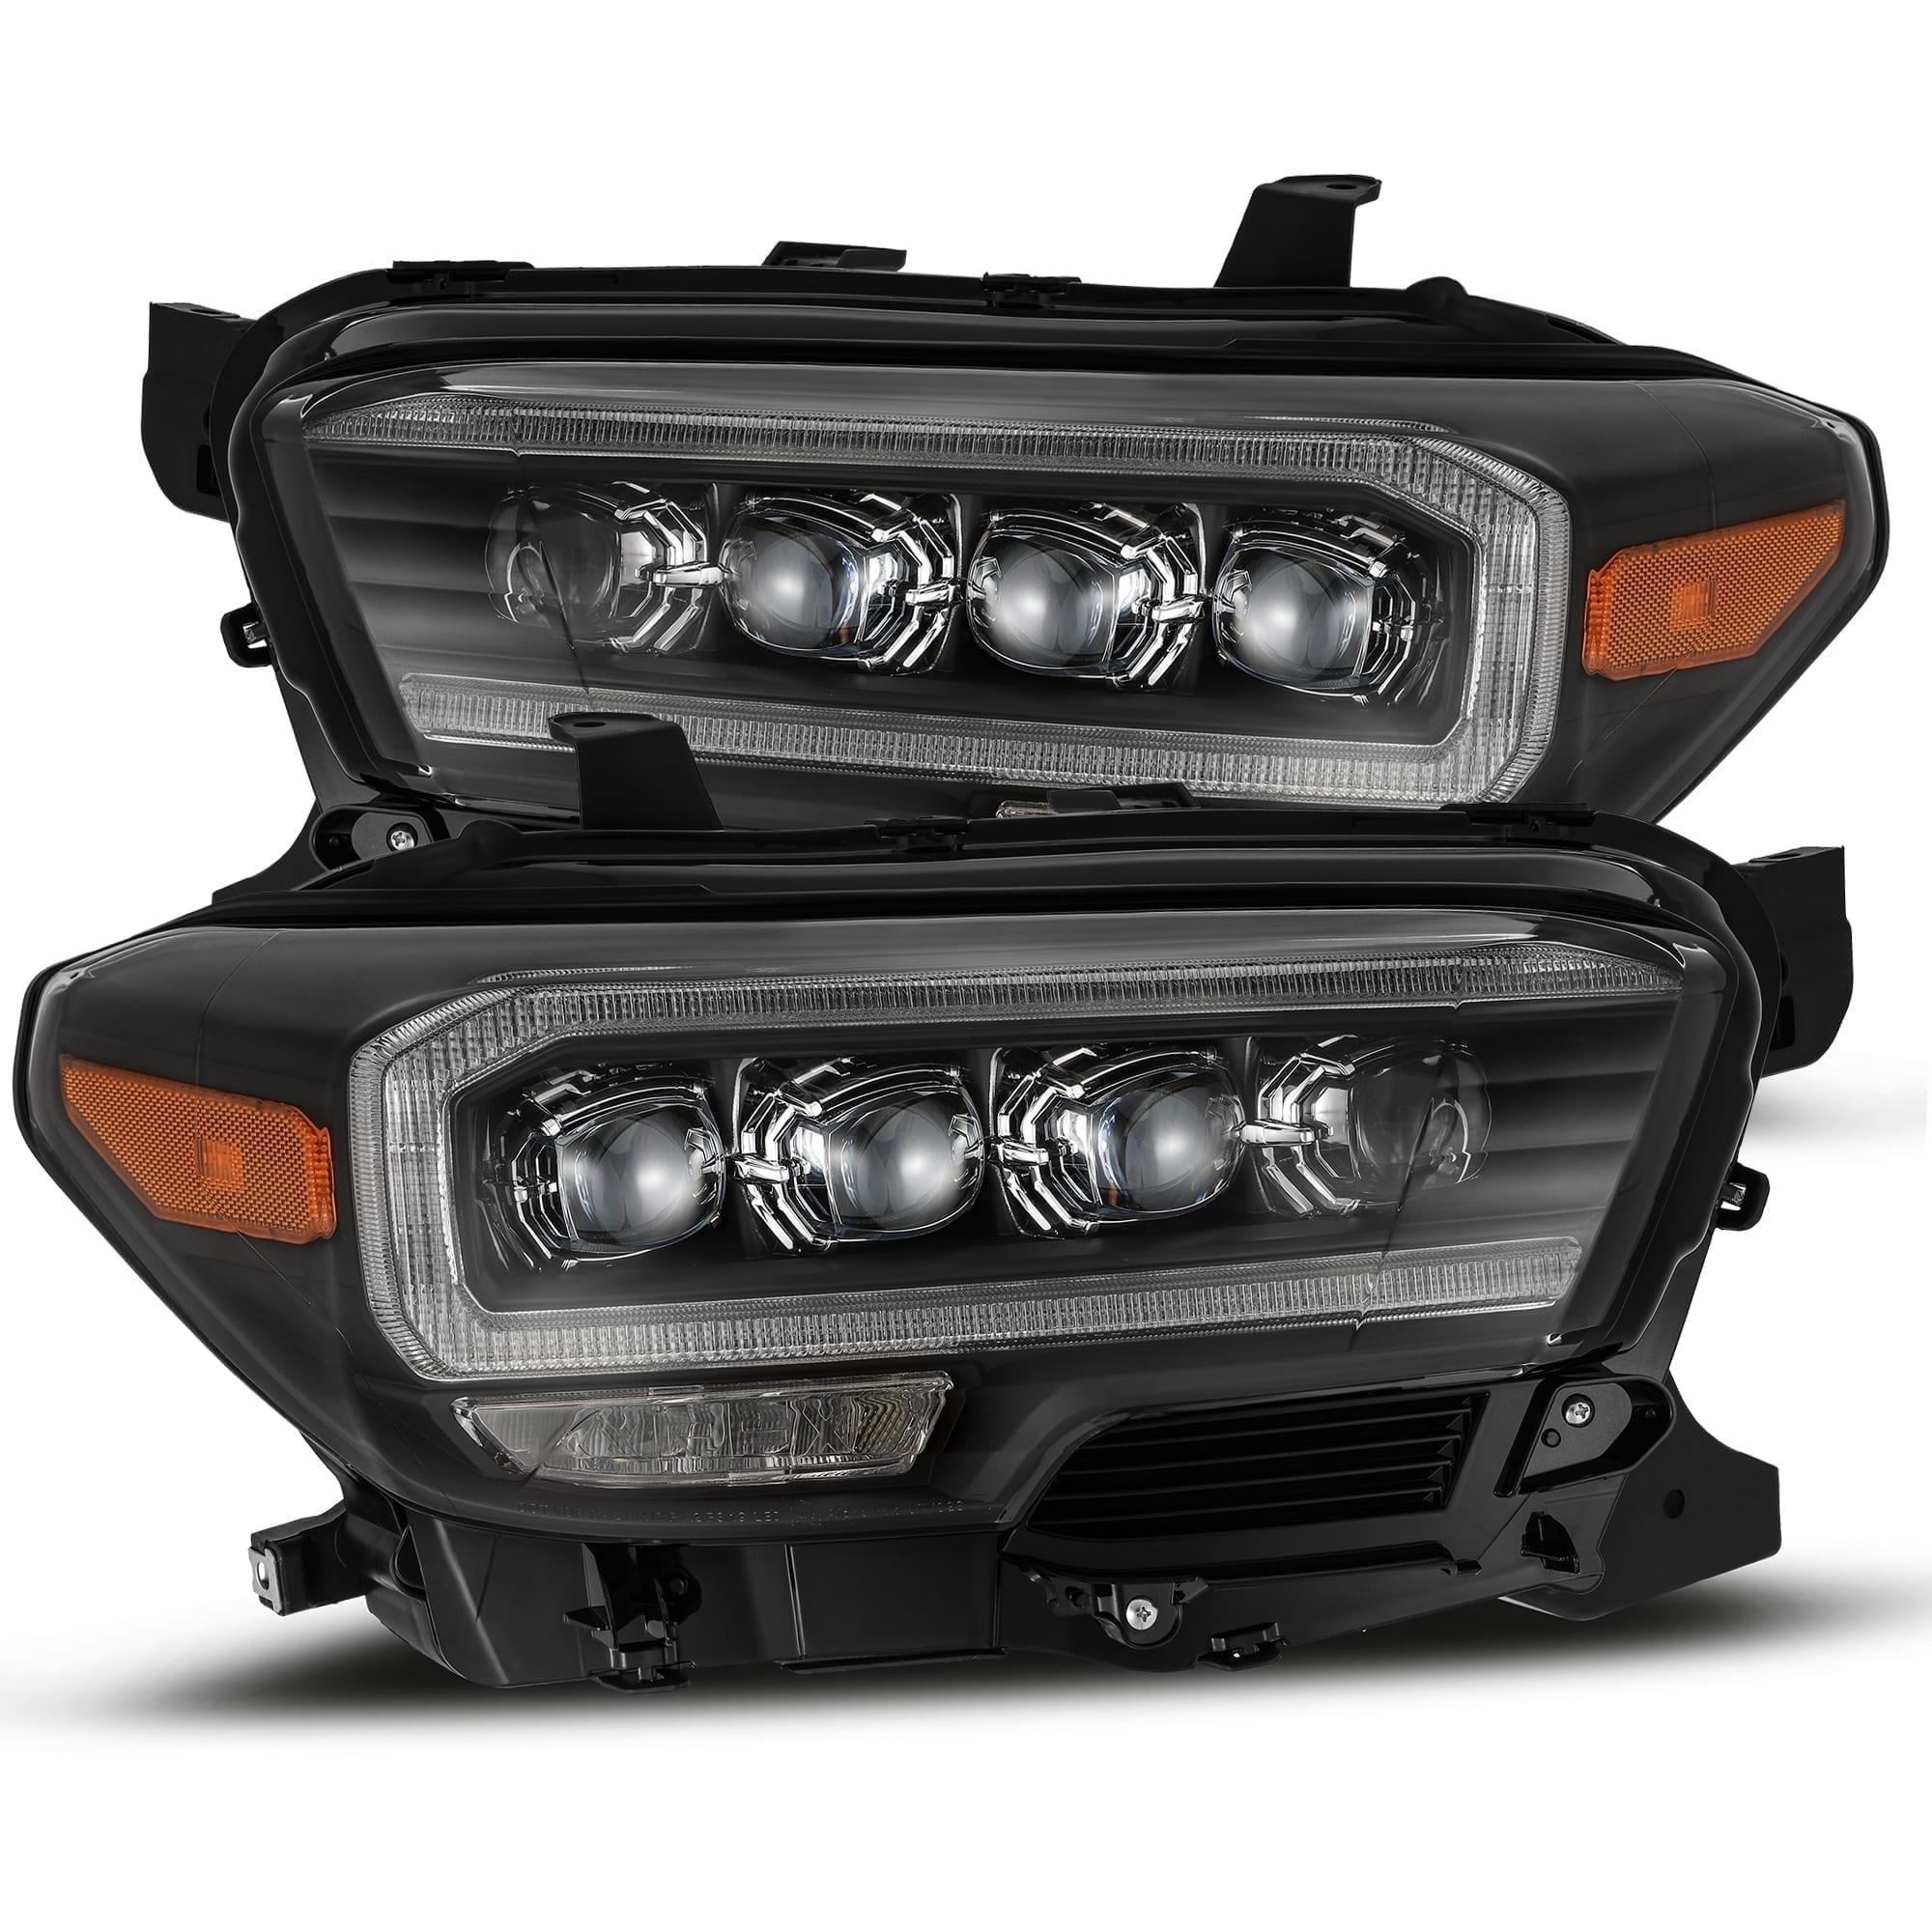 2016 2017 2018 2019 2020 Toyota Tacoma NOVA-Series LED Projector Headlights Black